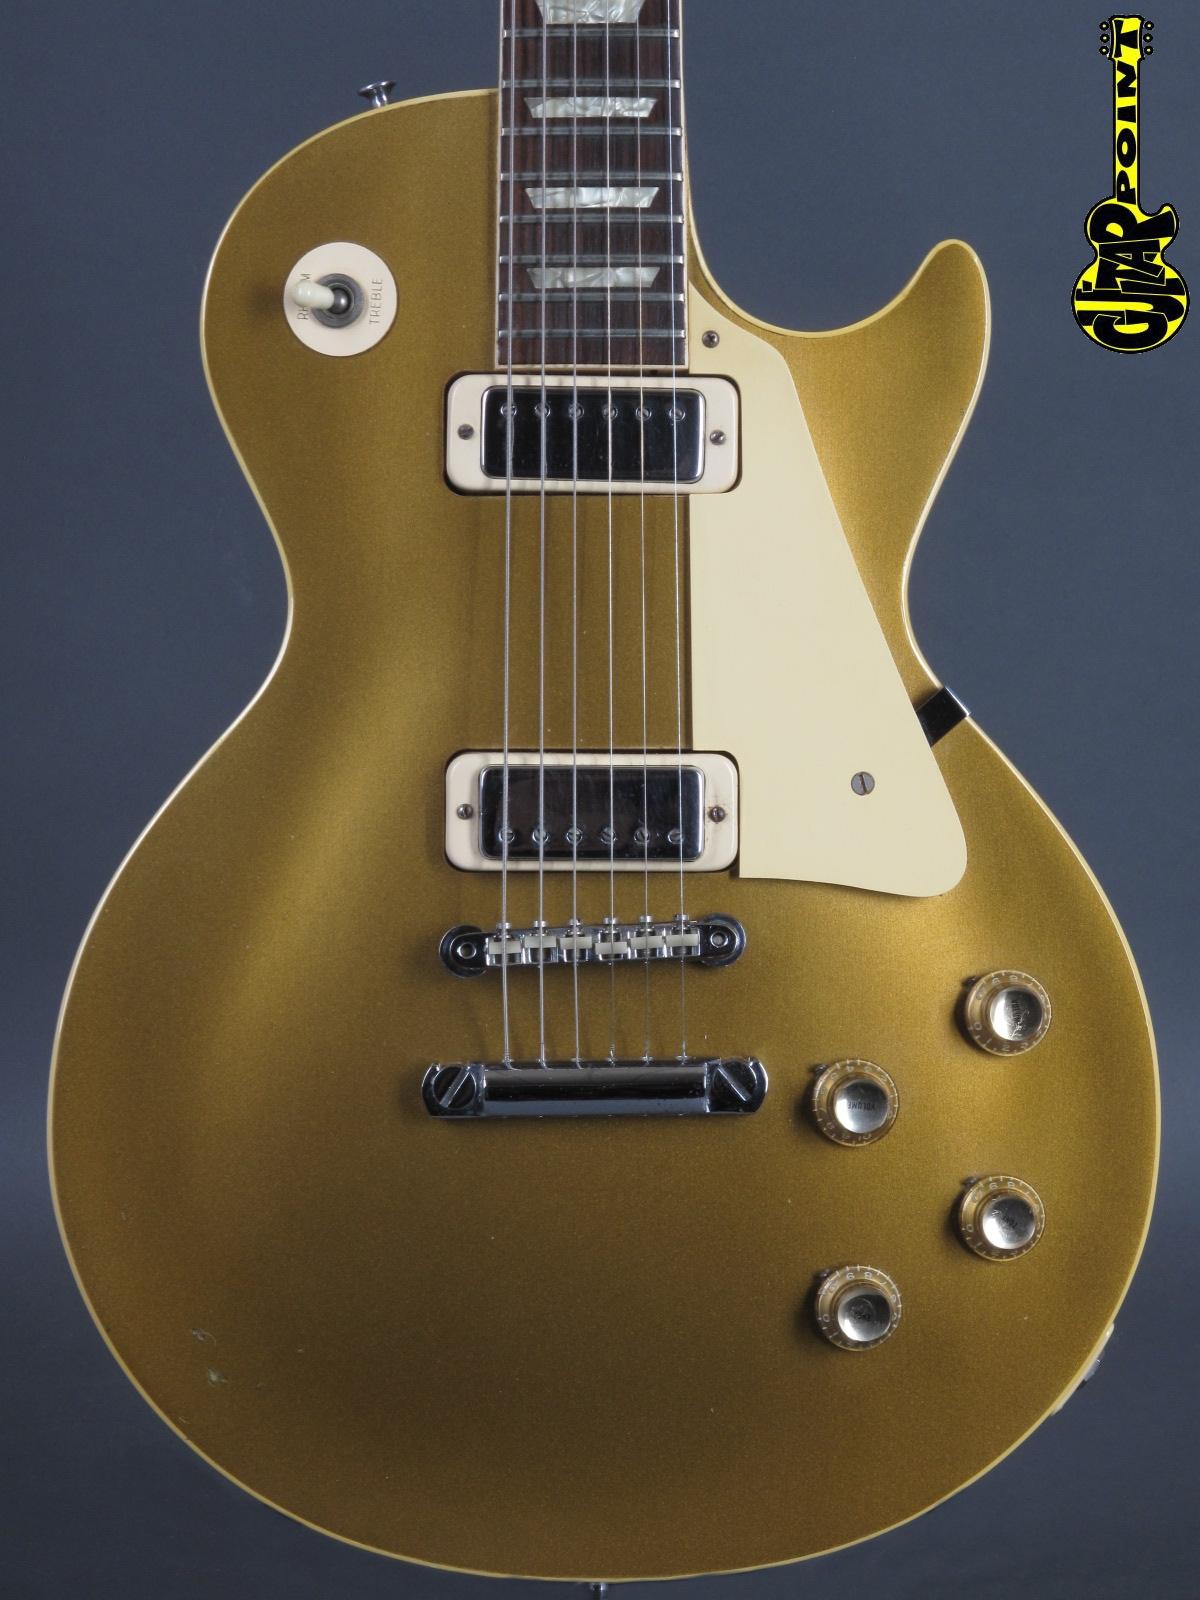 1969 Gibson Les Paul Deluxe - GoldTop